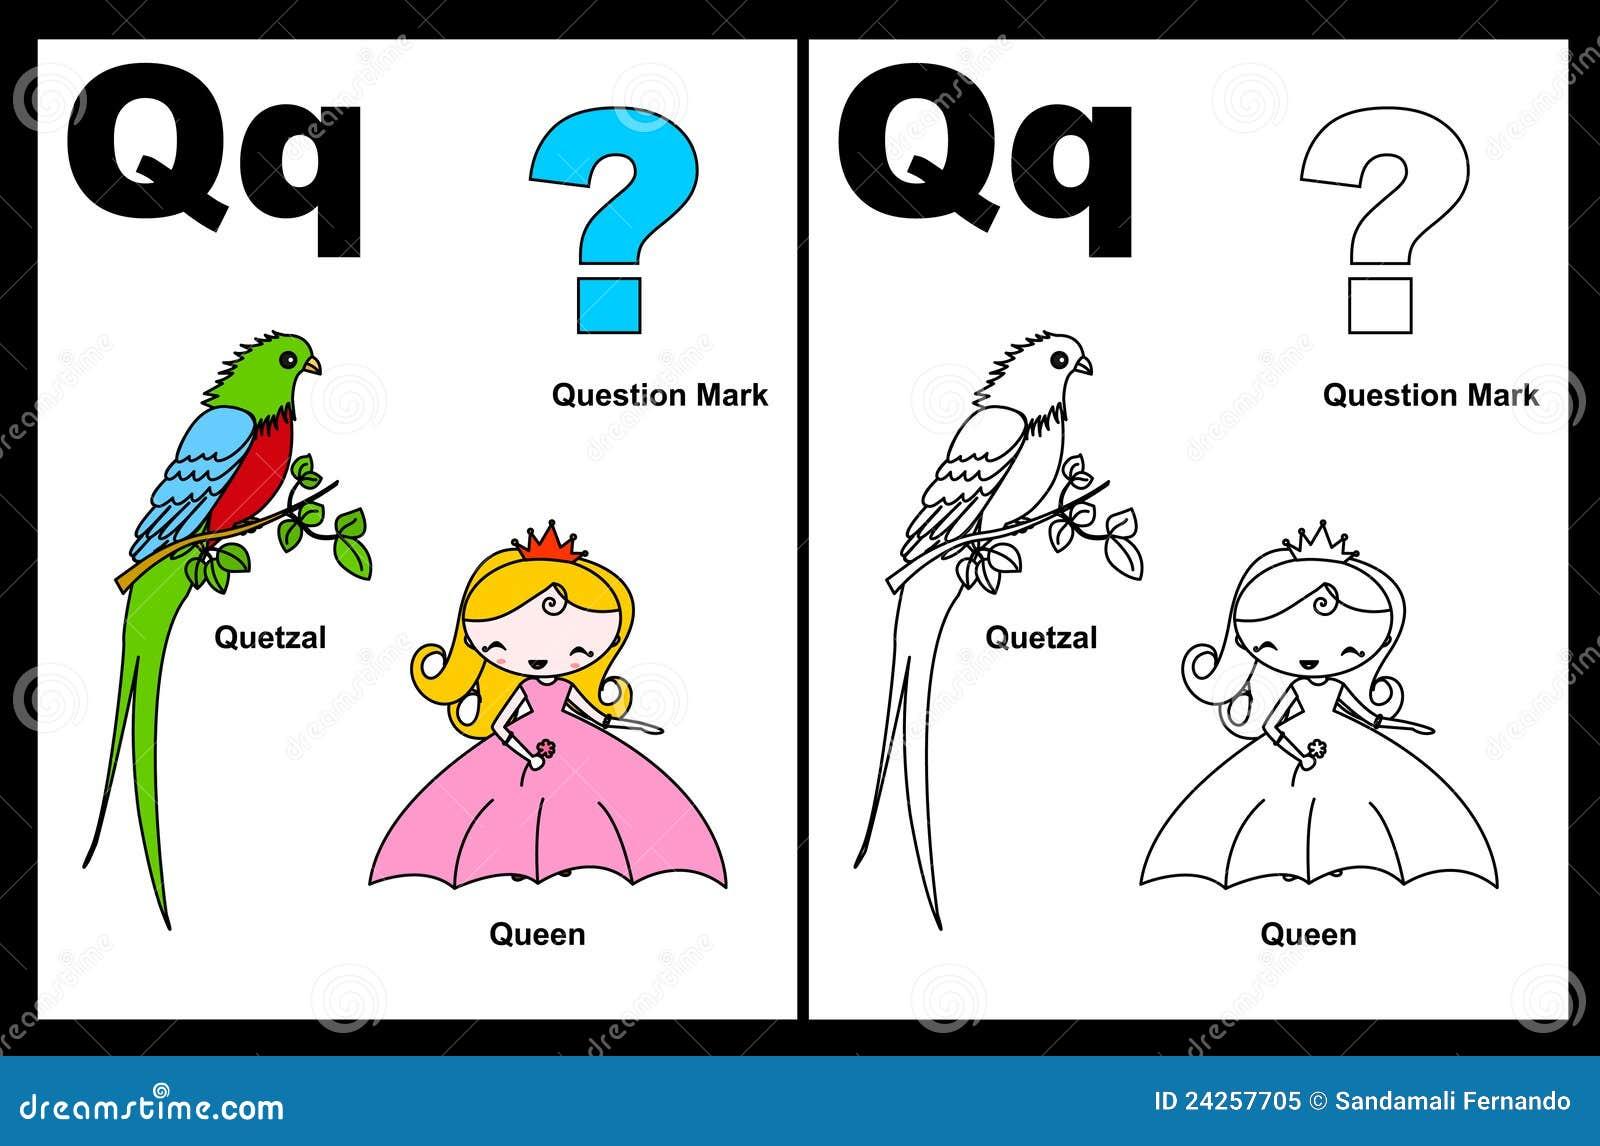 Letter Q Coloring Pages  dltkteachcom